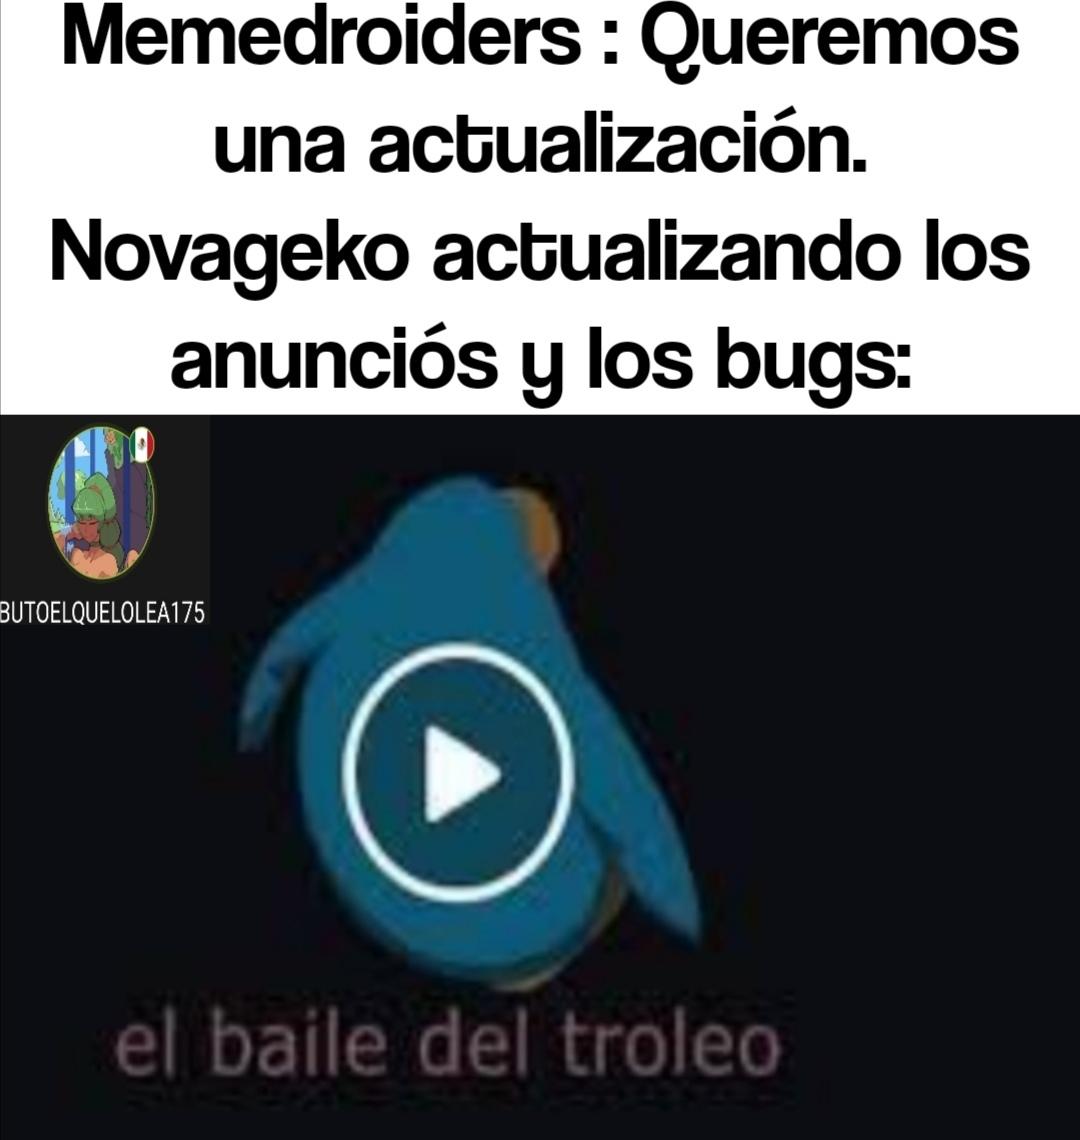 Novageko truliador - meme